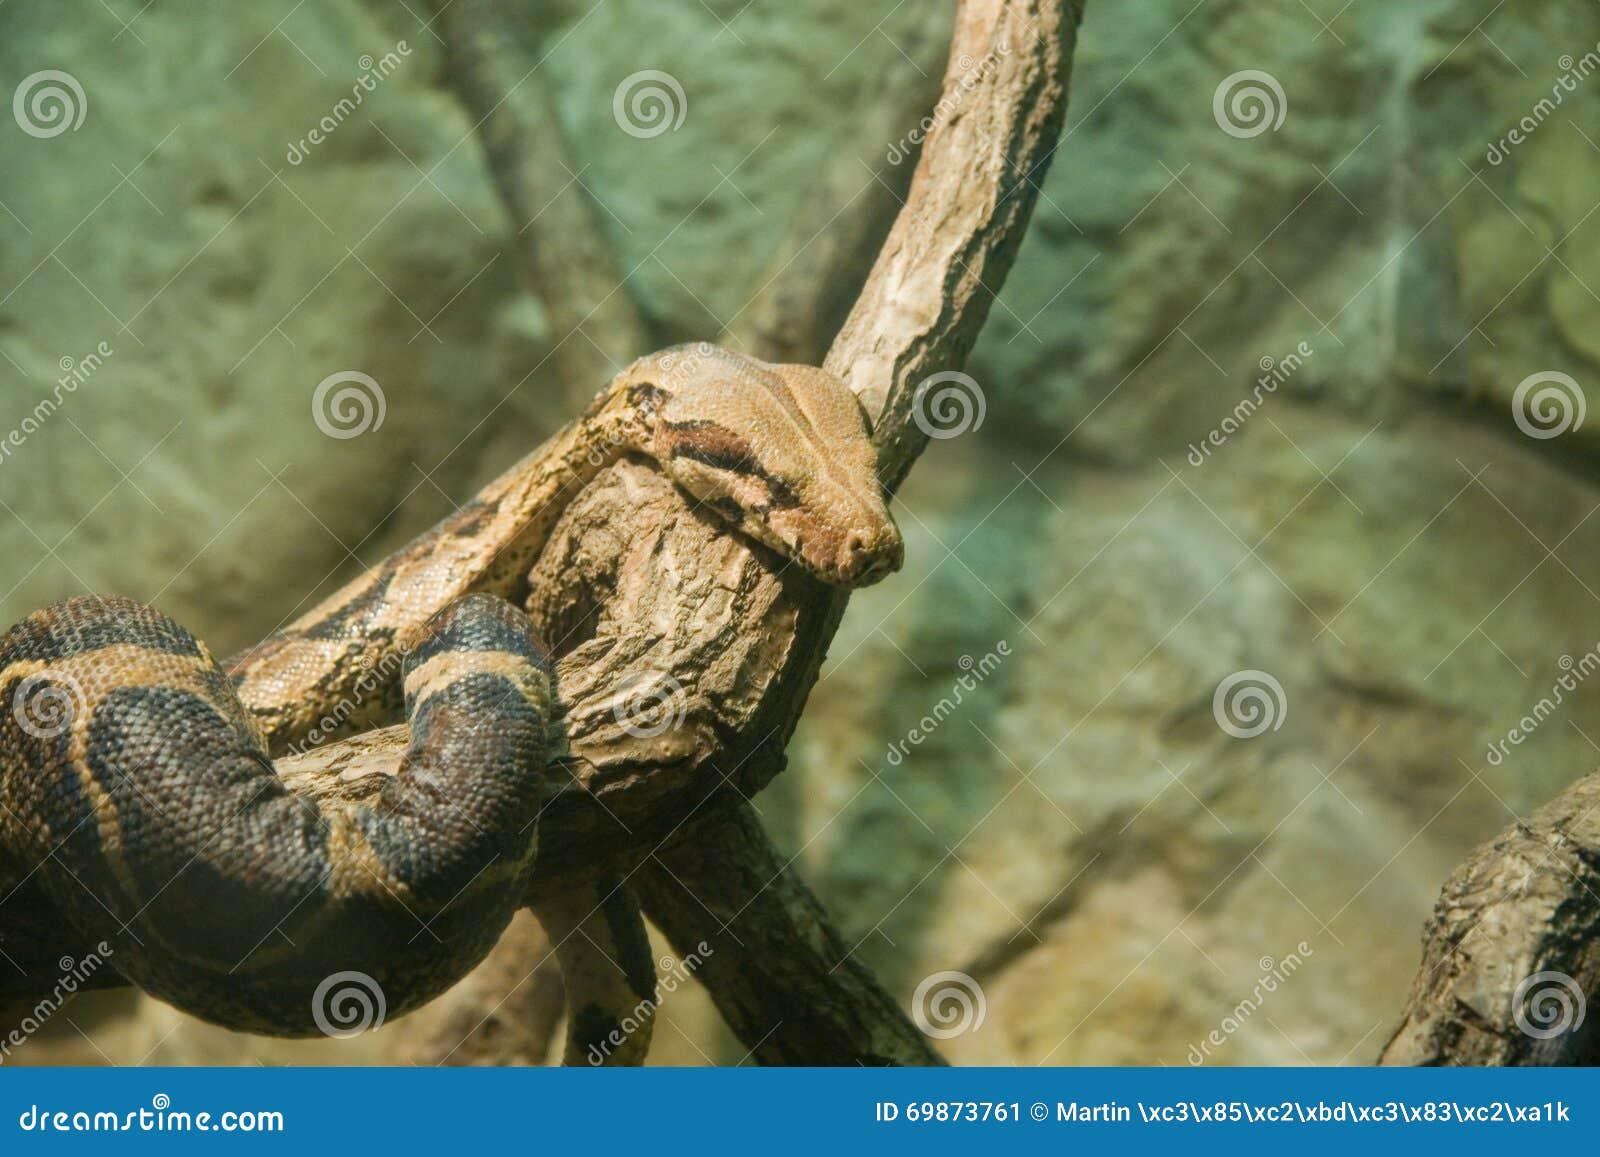 Constrictor de boa